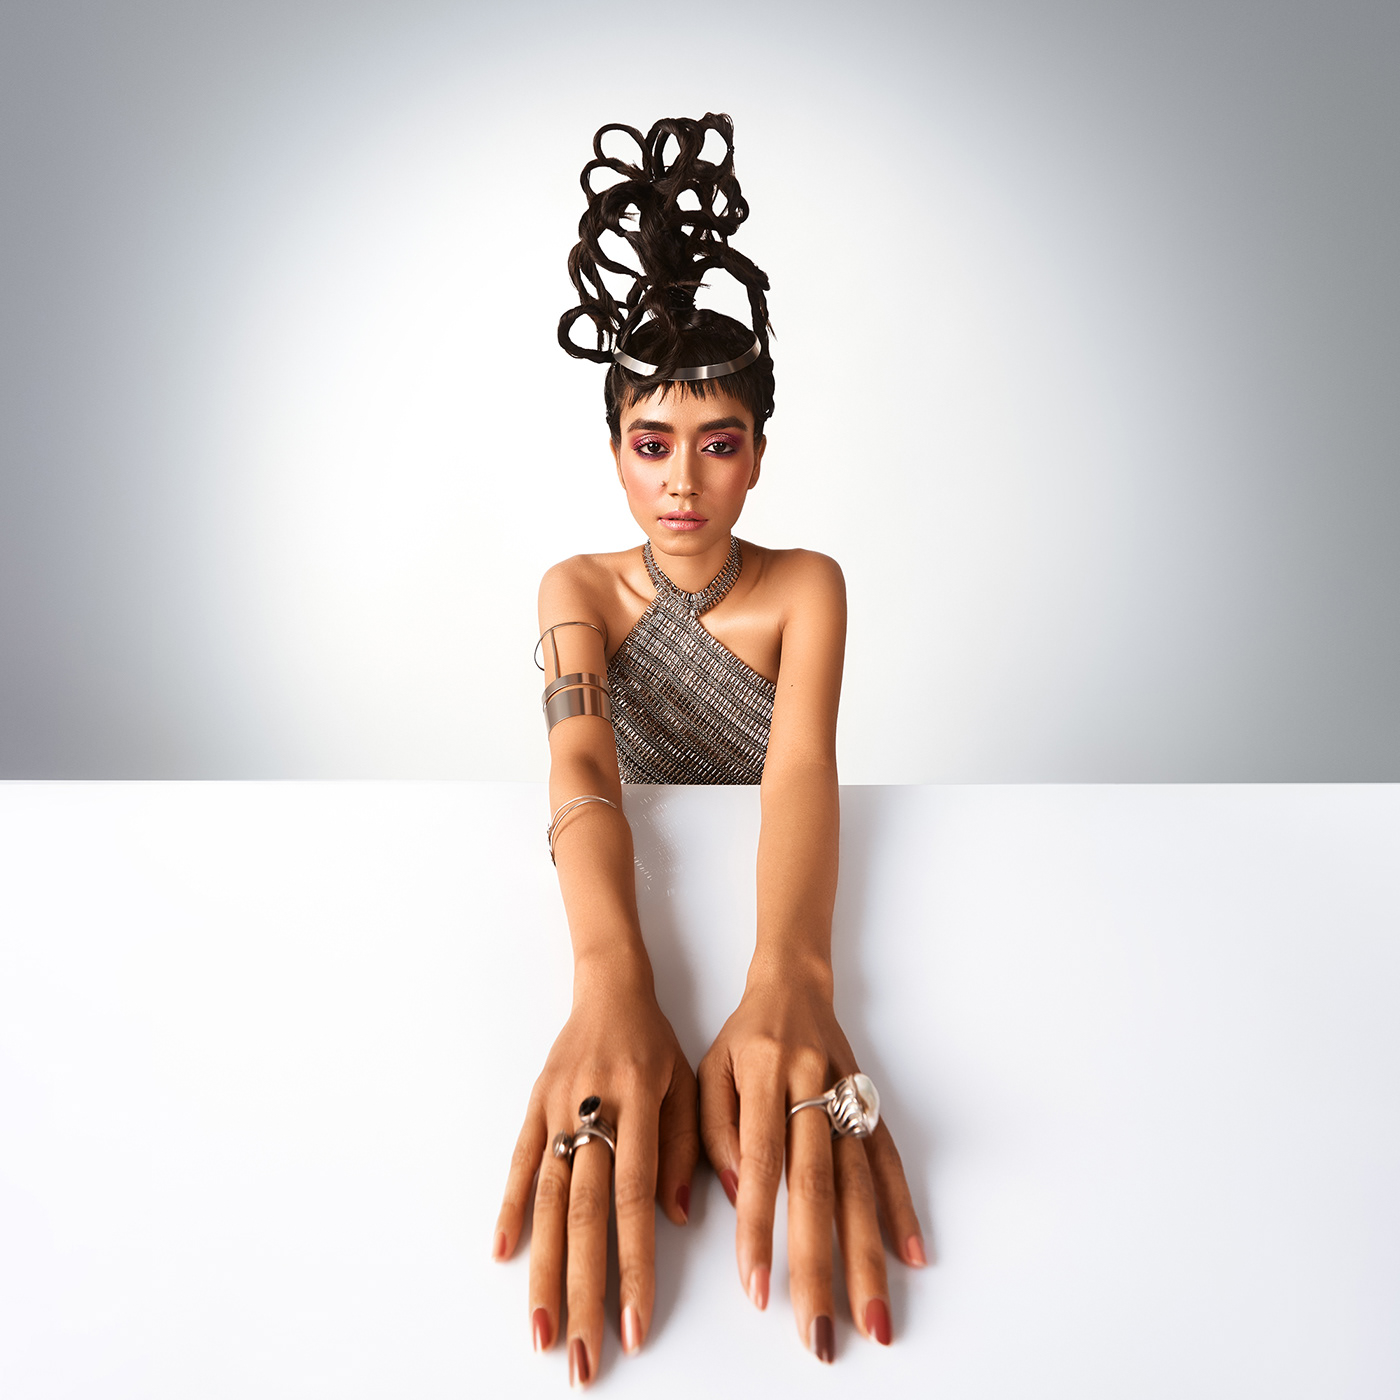 beauty editorial Fashion  India magazine MUMBAI Photography  portrait studio styling